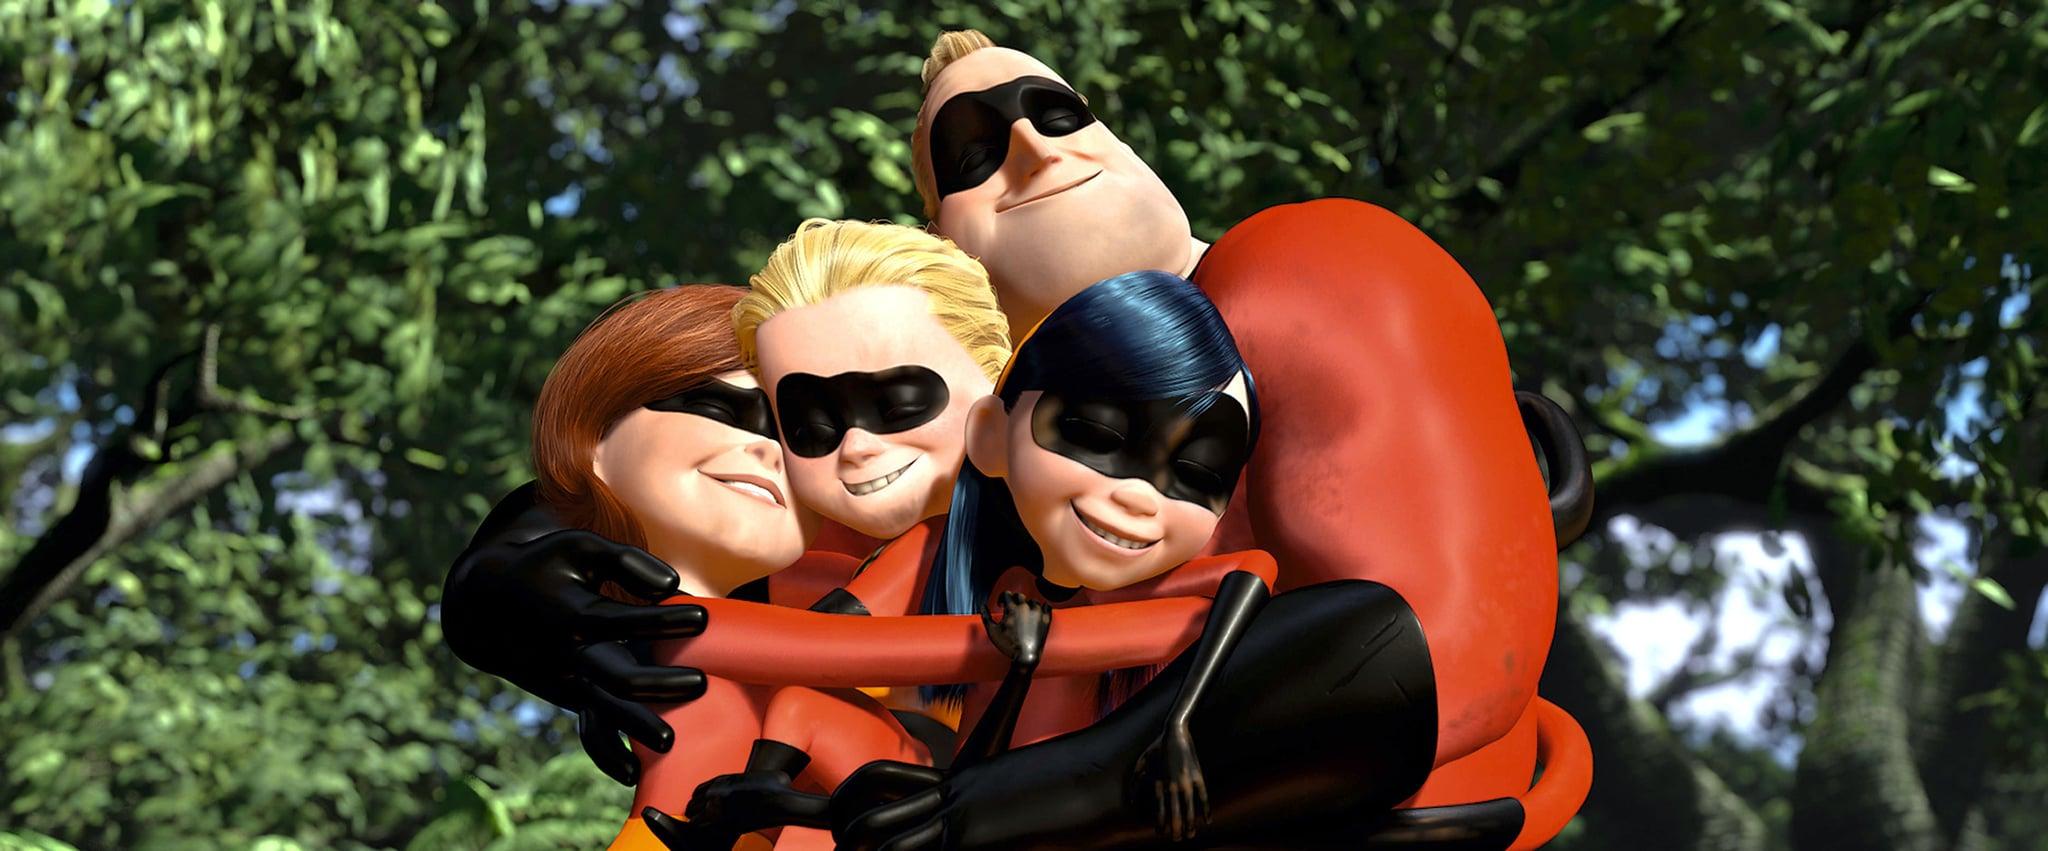 THE INCREDIBLES, Elastigirl, Dash, Mr. Incredible, Violet, 2004, (c) Walt Disney/courtesy Everett Collection